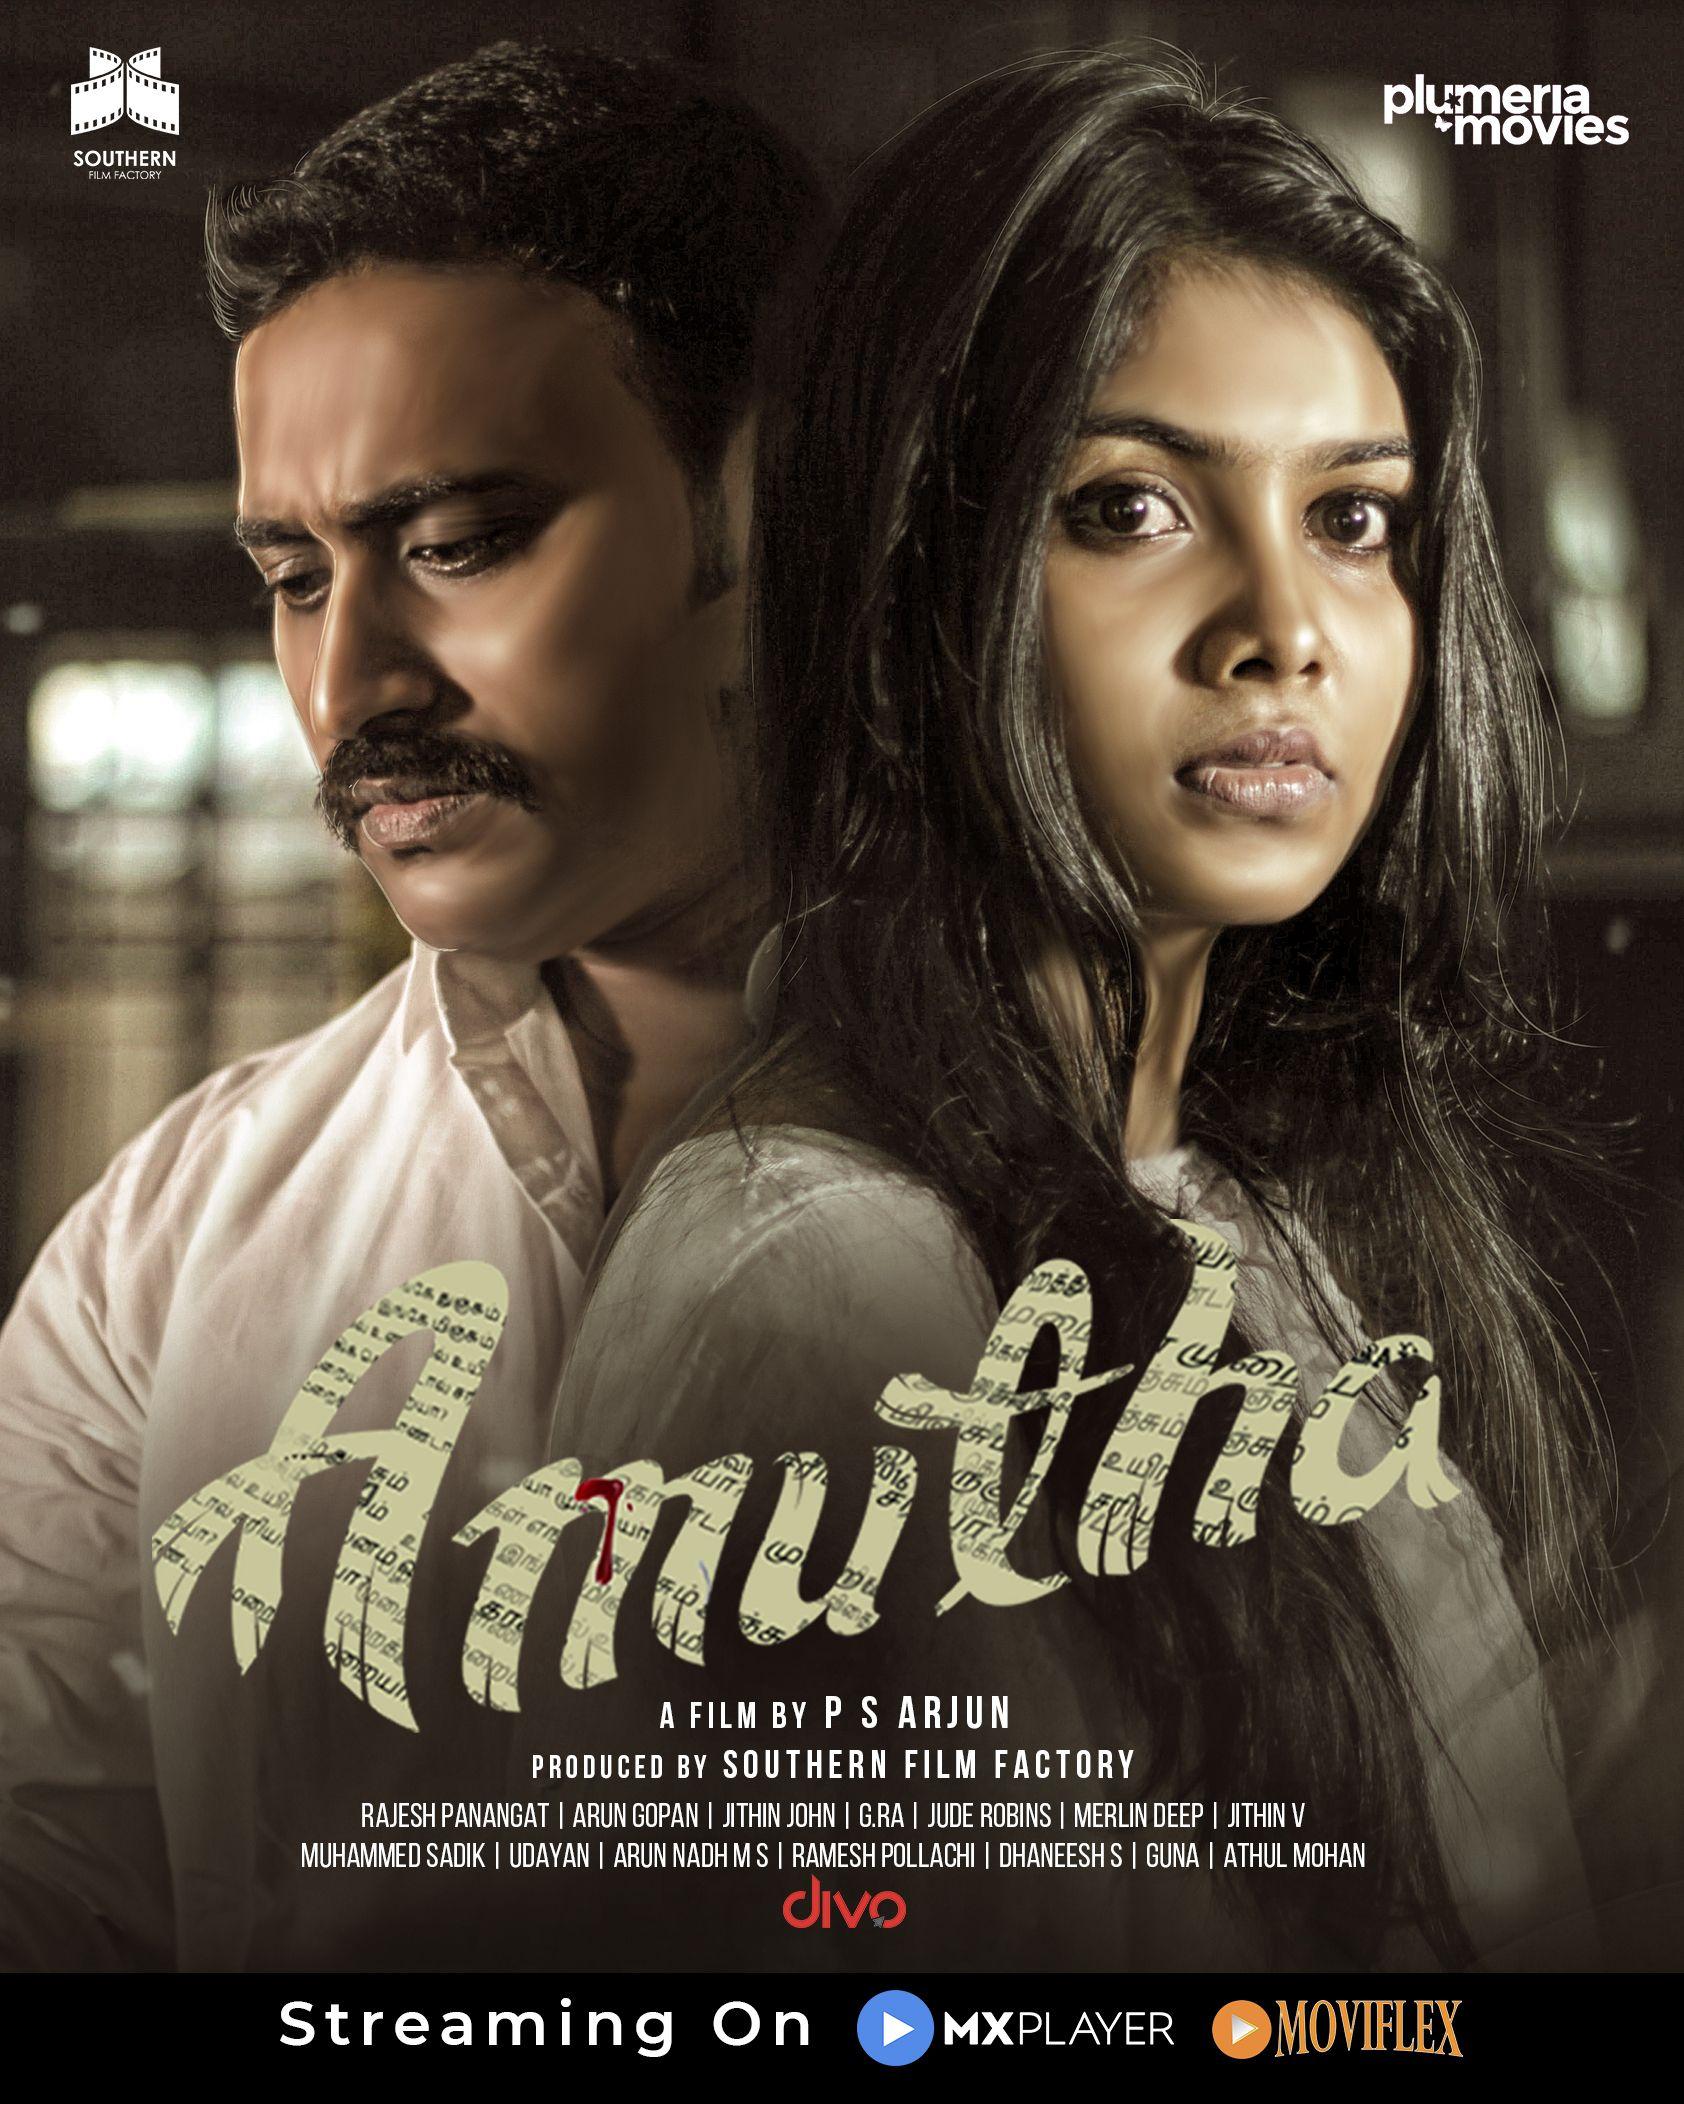 23 Movie Posters ideas in 2021 | movie posters, tamil movies, pr agency